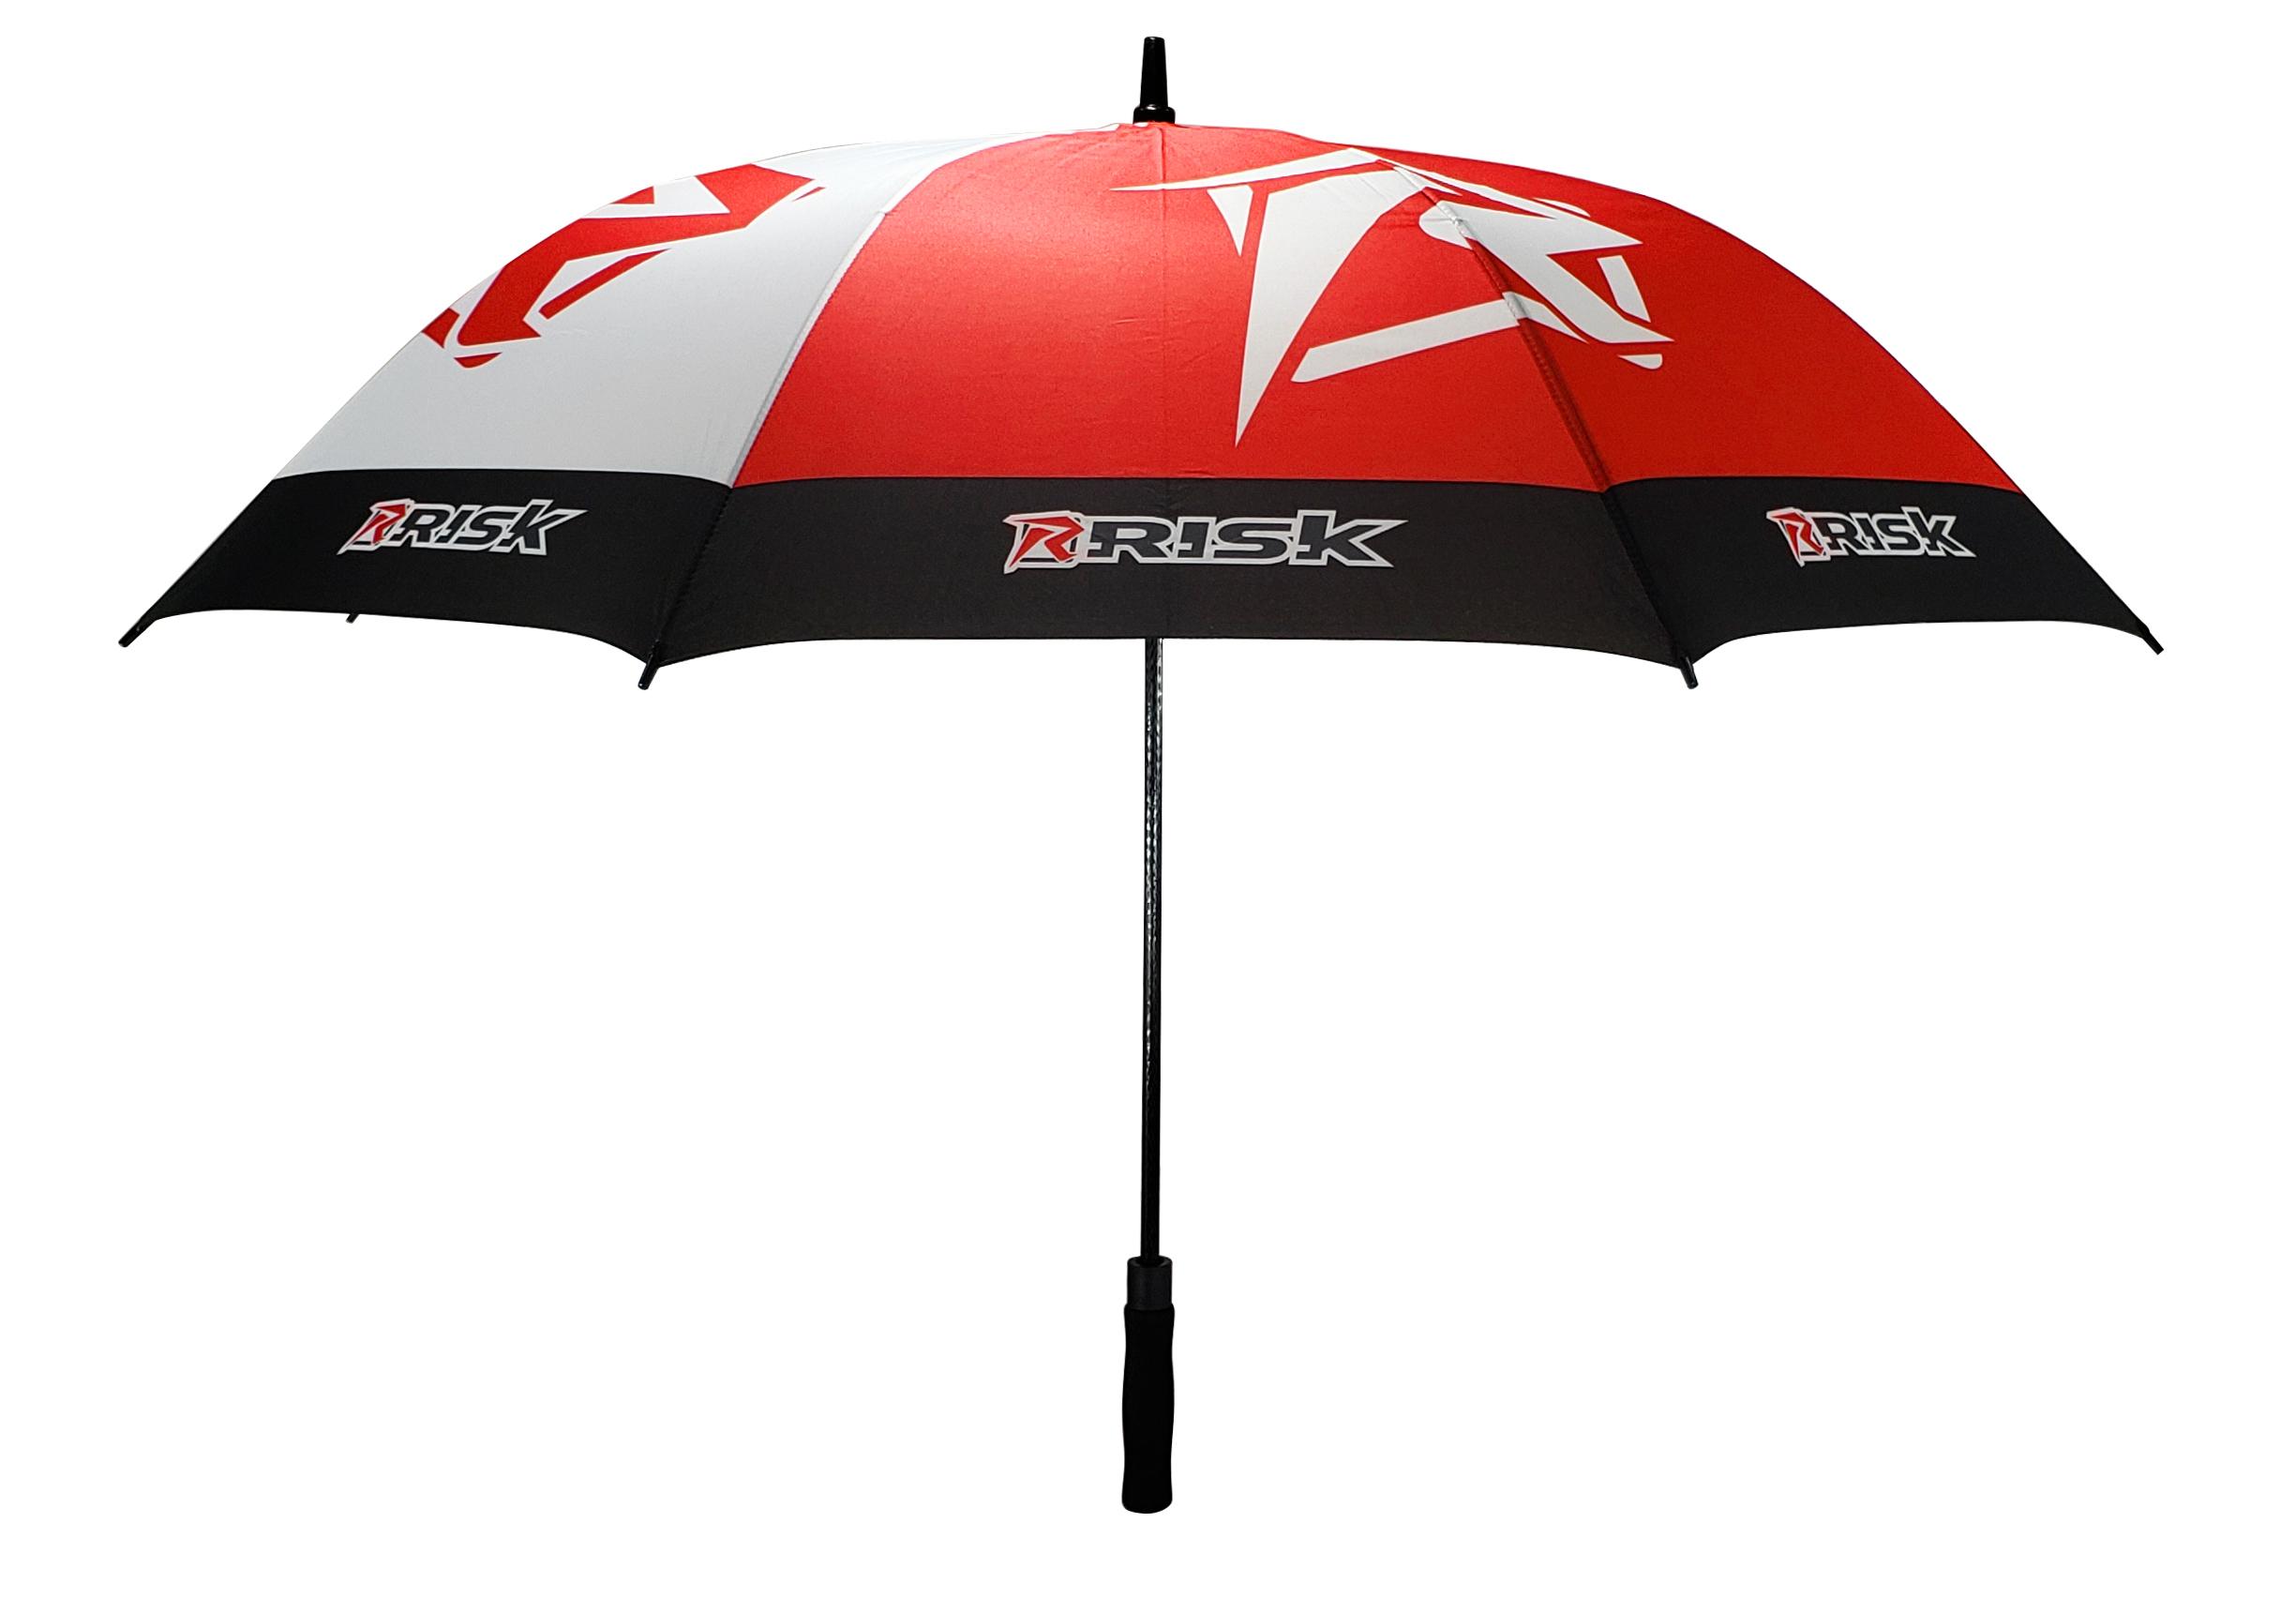 Risk Racing Motocross Umbrella Auto Open_4